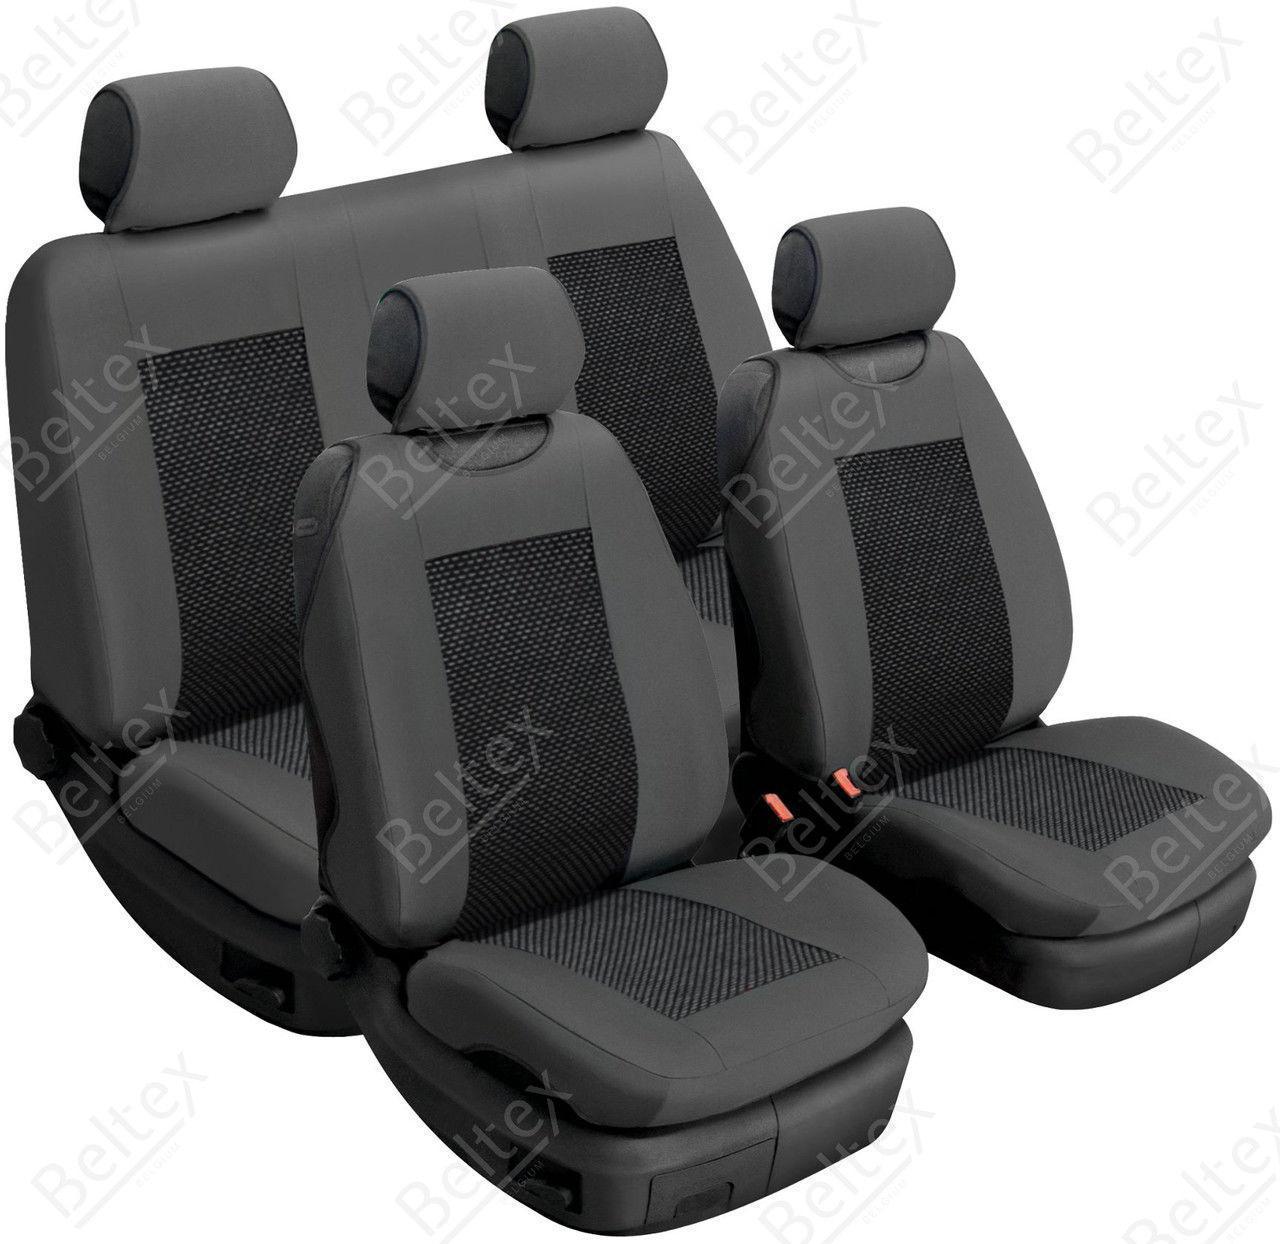 Майки/чехлы на сиденья Форд Транзит Кастом (Ford Transit Custom)